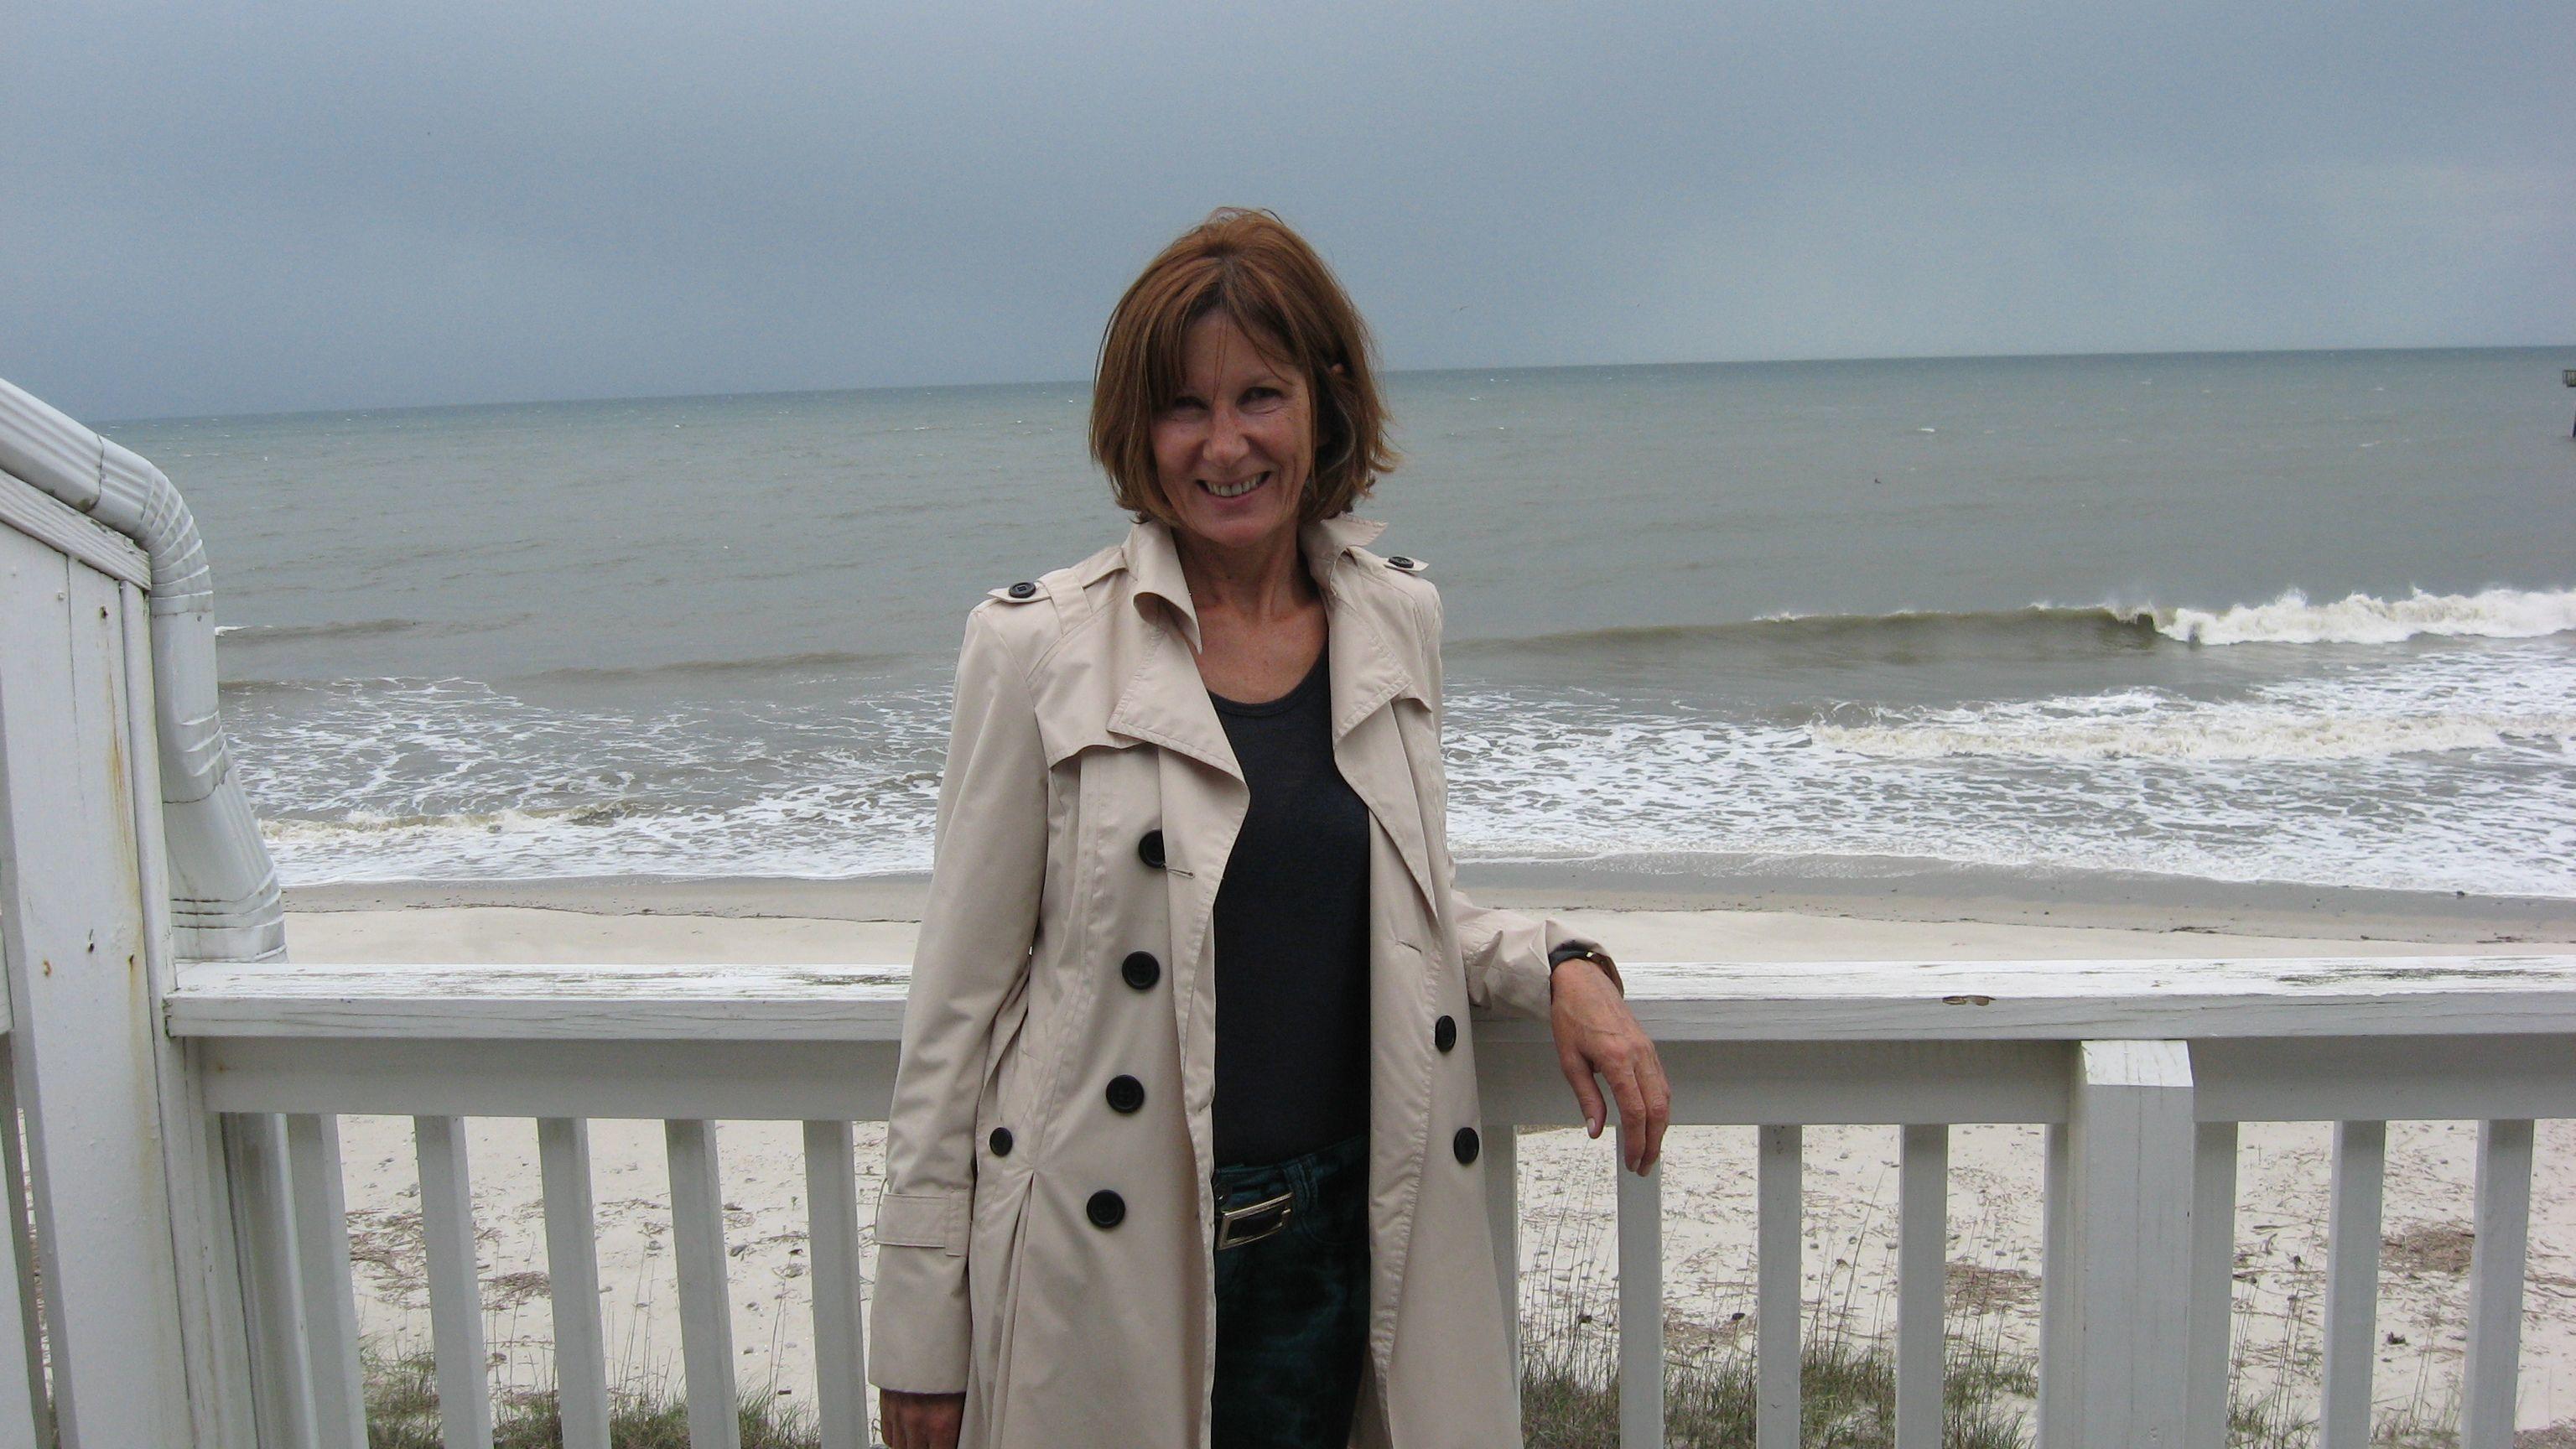 catherine older women cheap travel washington dc